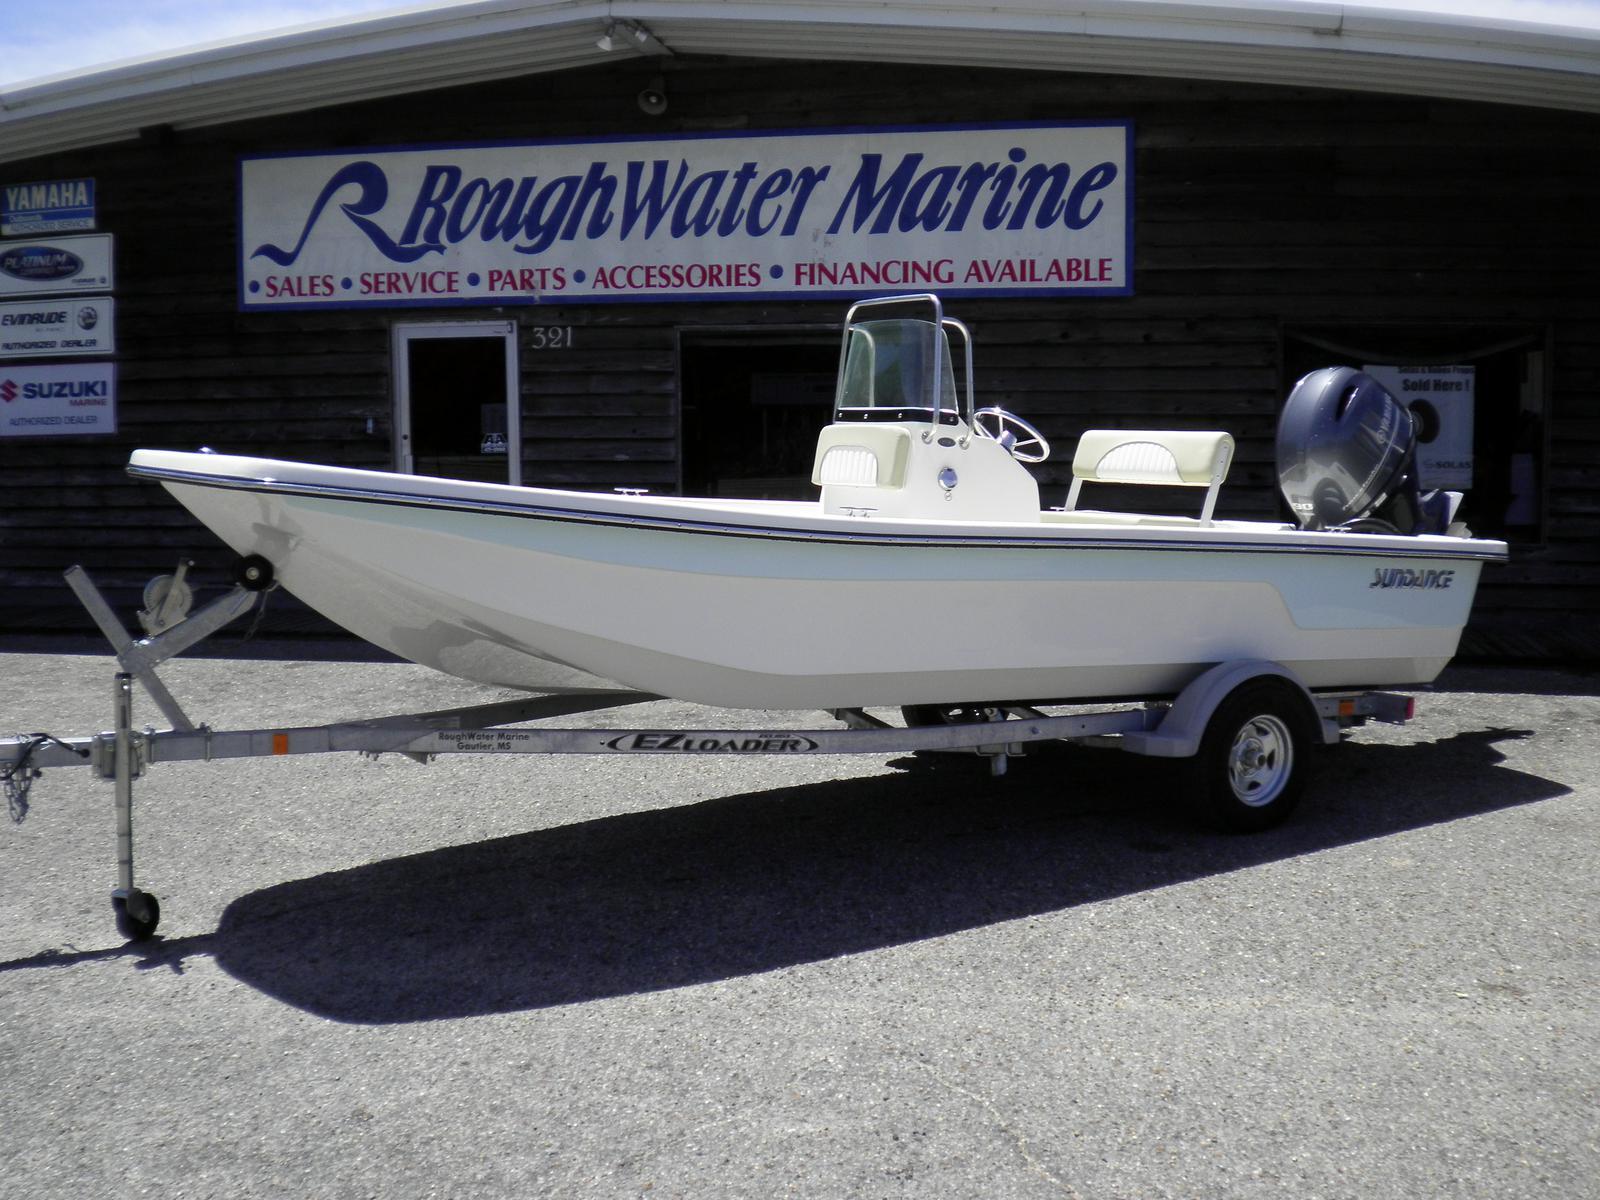 Inventory RoughWater Marine Gautier, MS (228) 497-2214